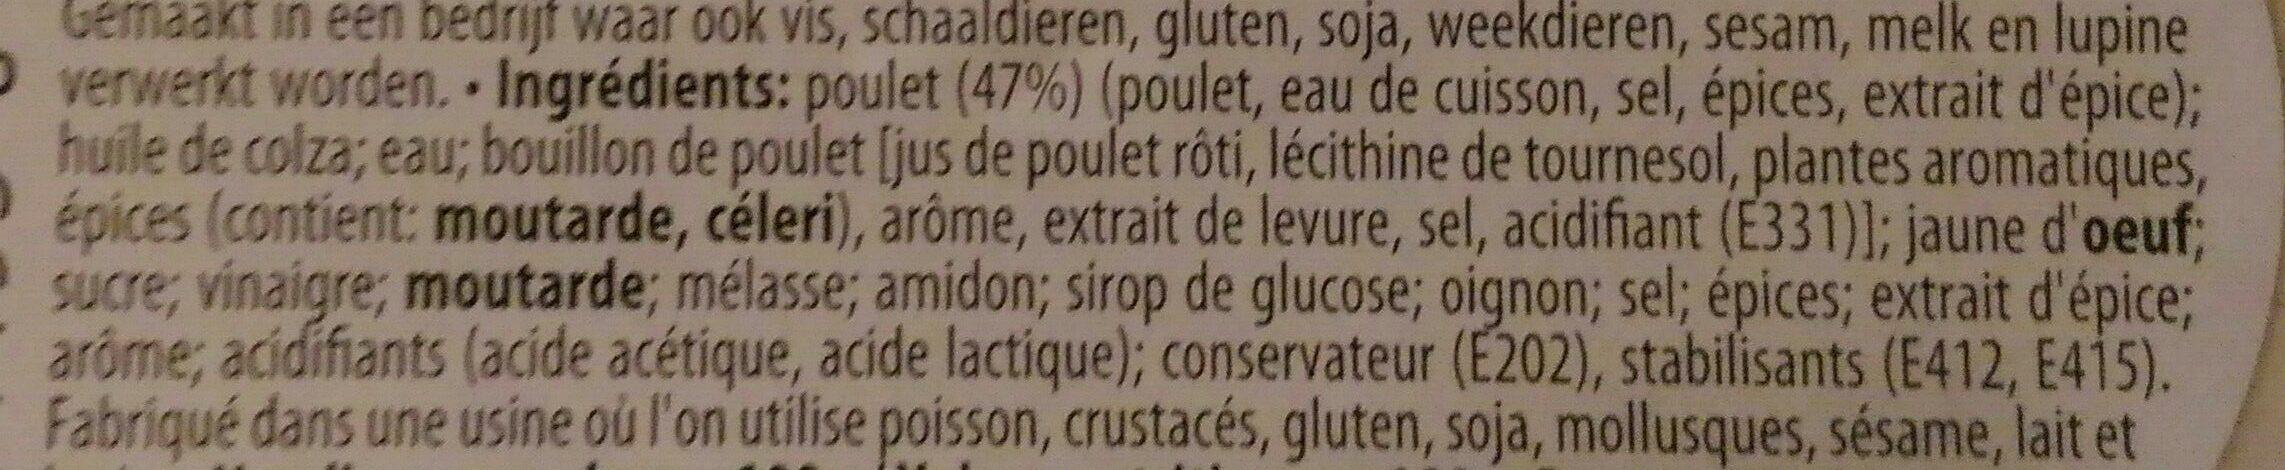 Salade De Poulet 200 gr - Ingrediënten